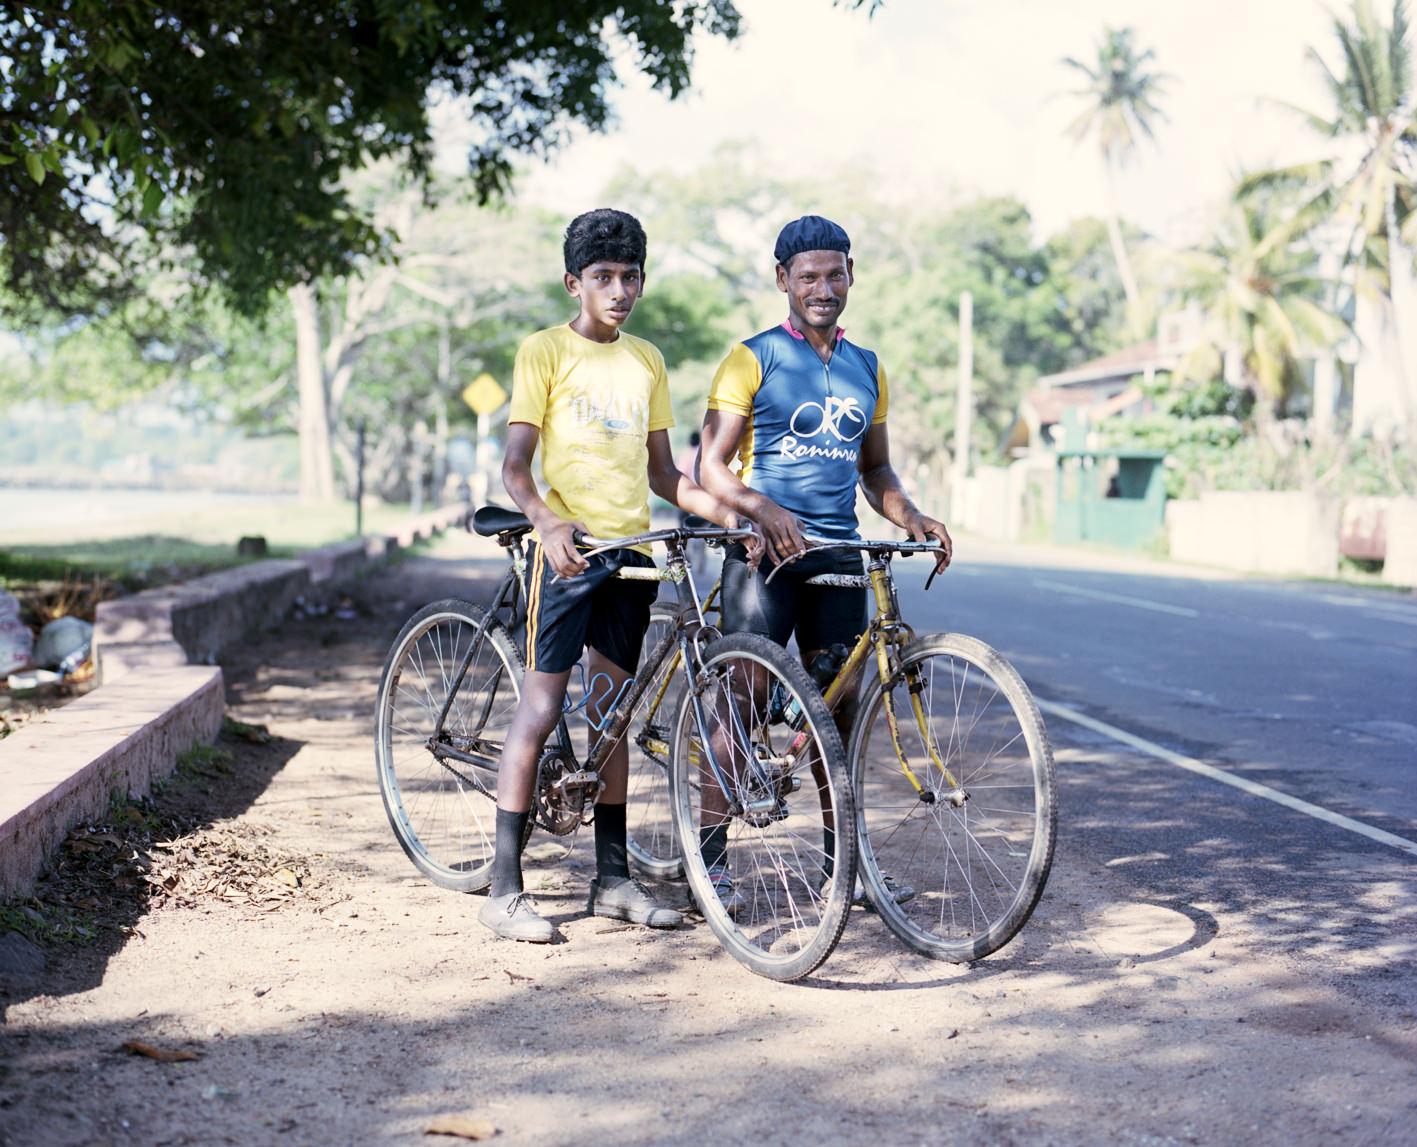 cyclist (35)_b-1.jpg